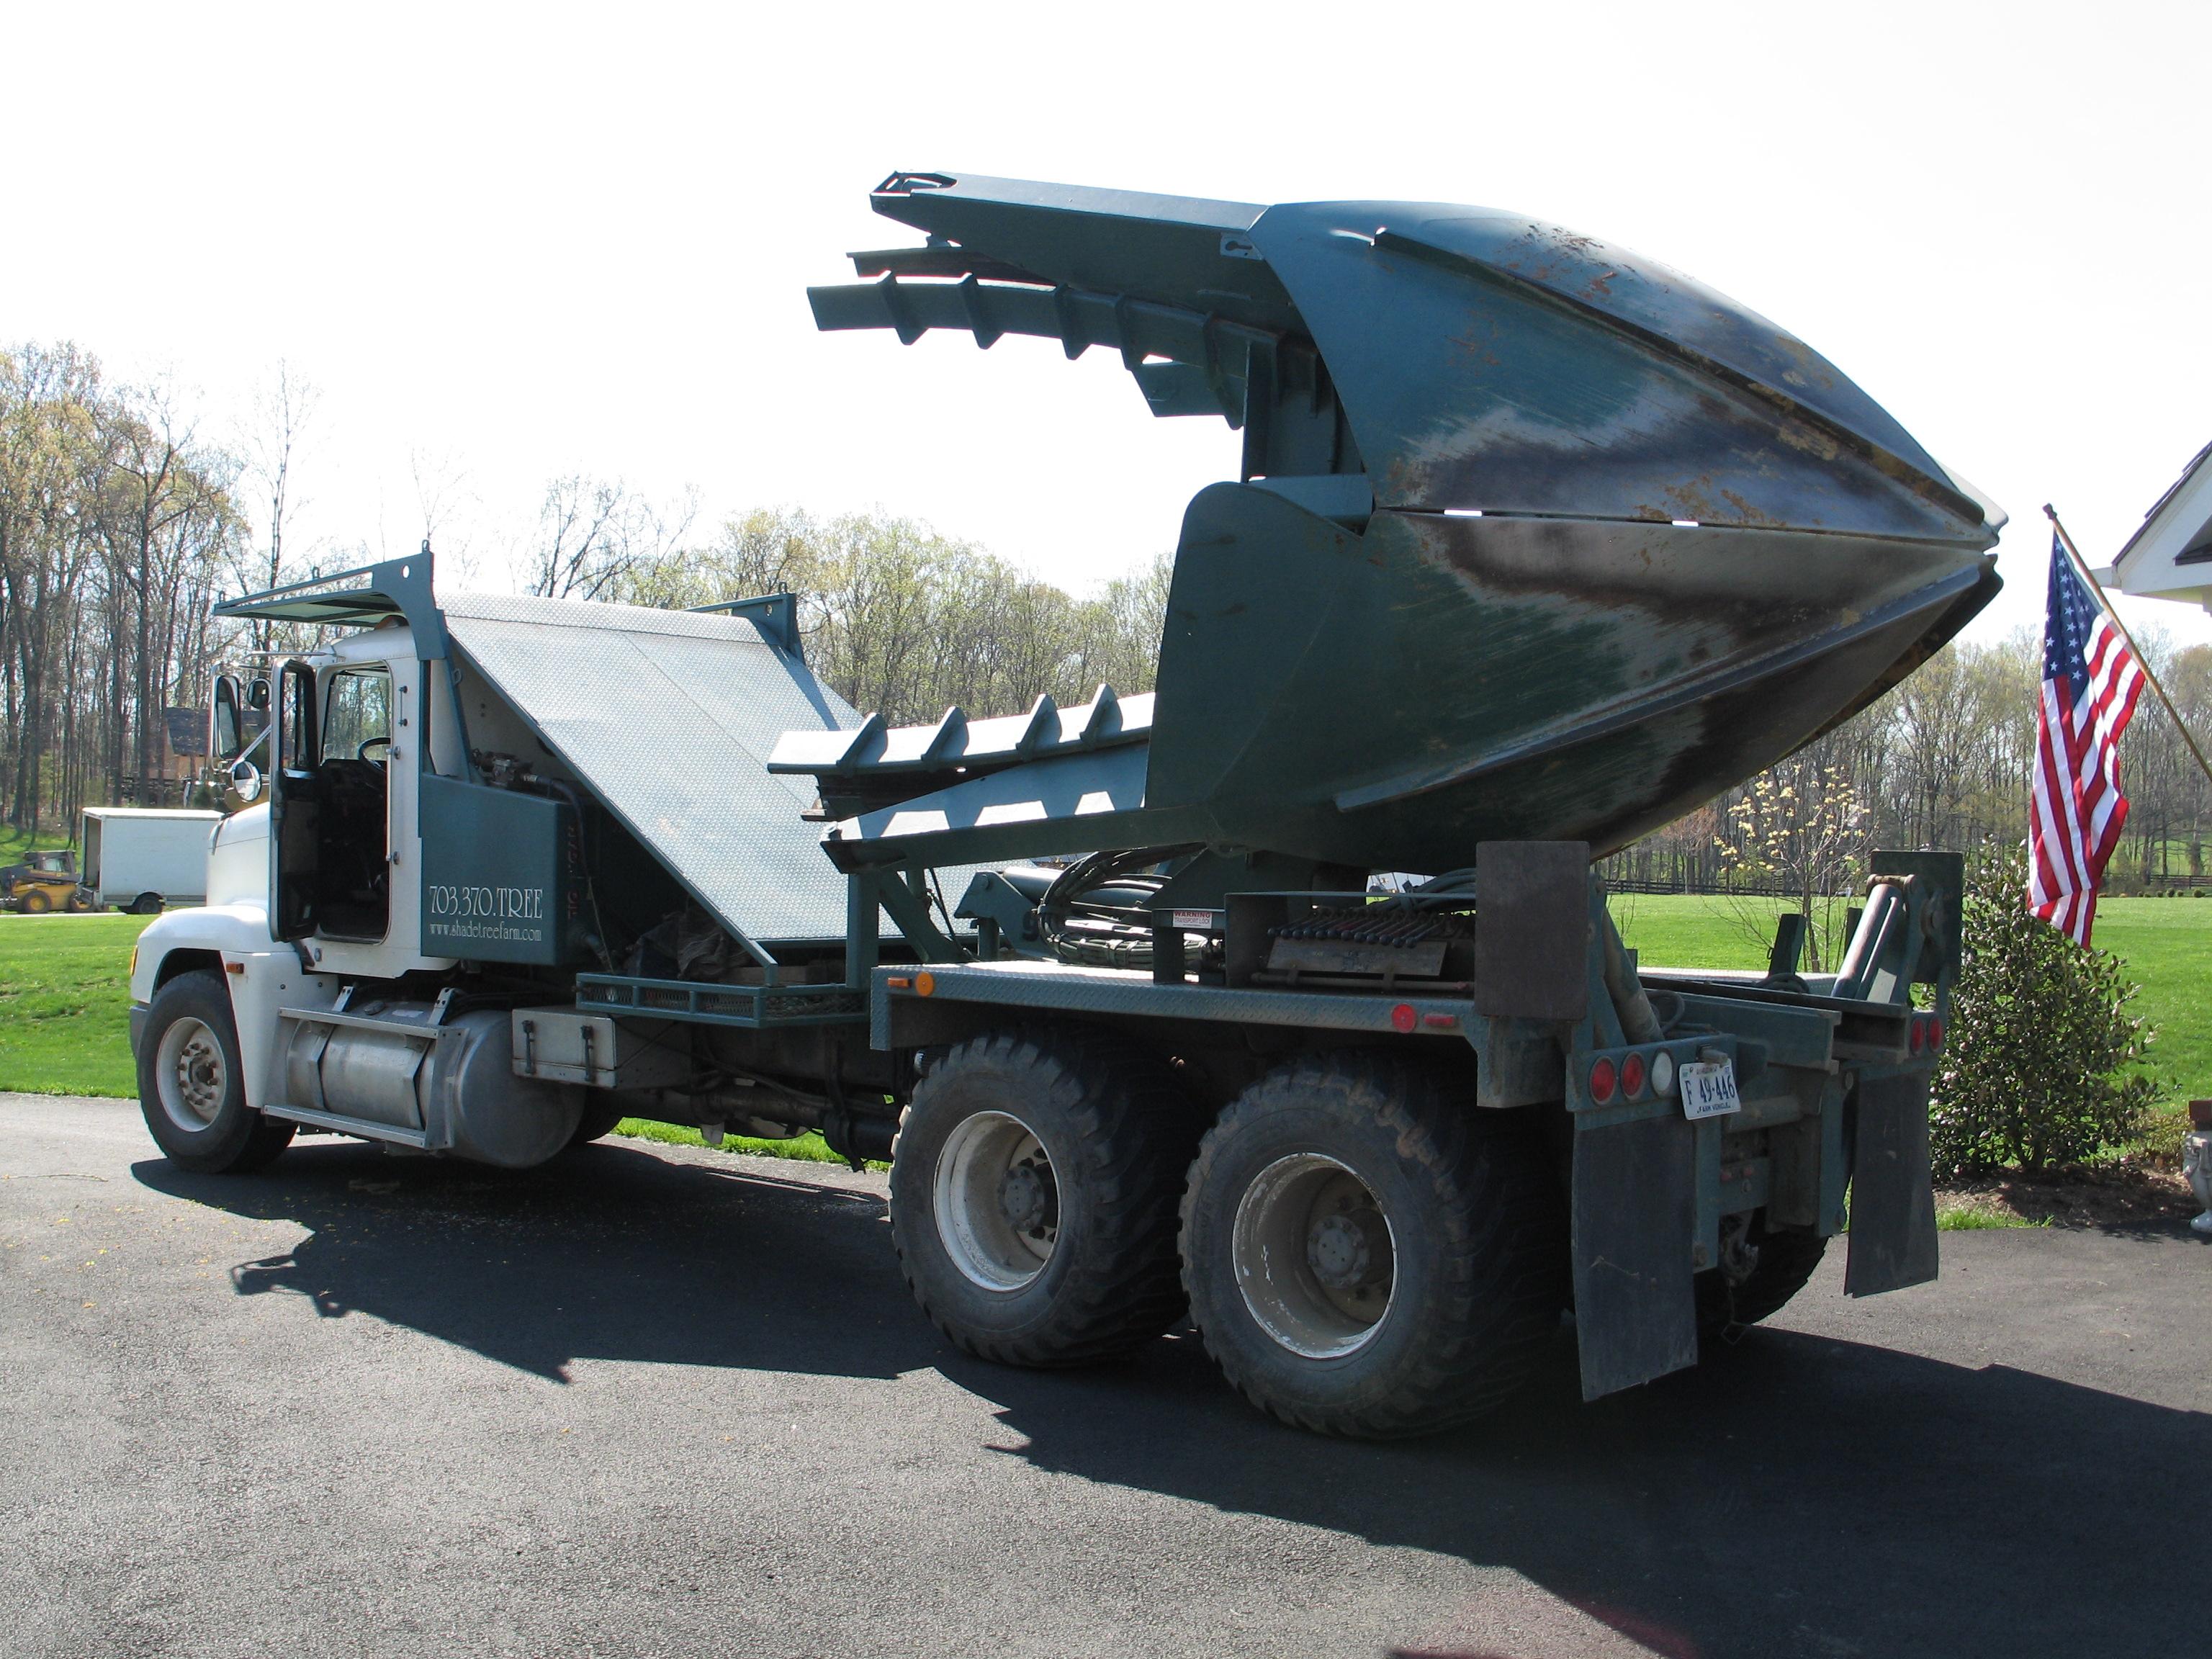 Albero Trapianto Servizi http://www.dutchmantreespade.com/ 1-Tree-spade-truck-arrives